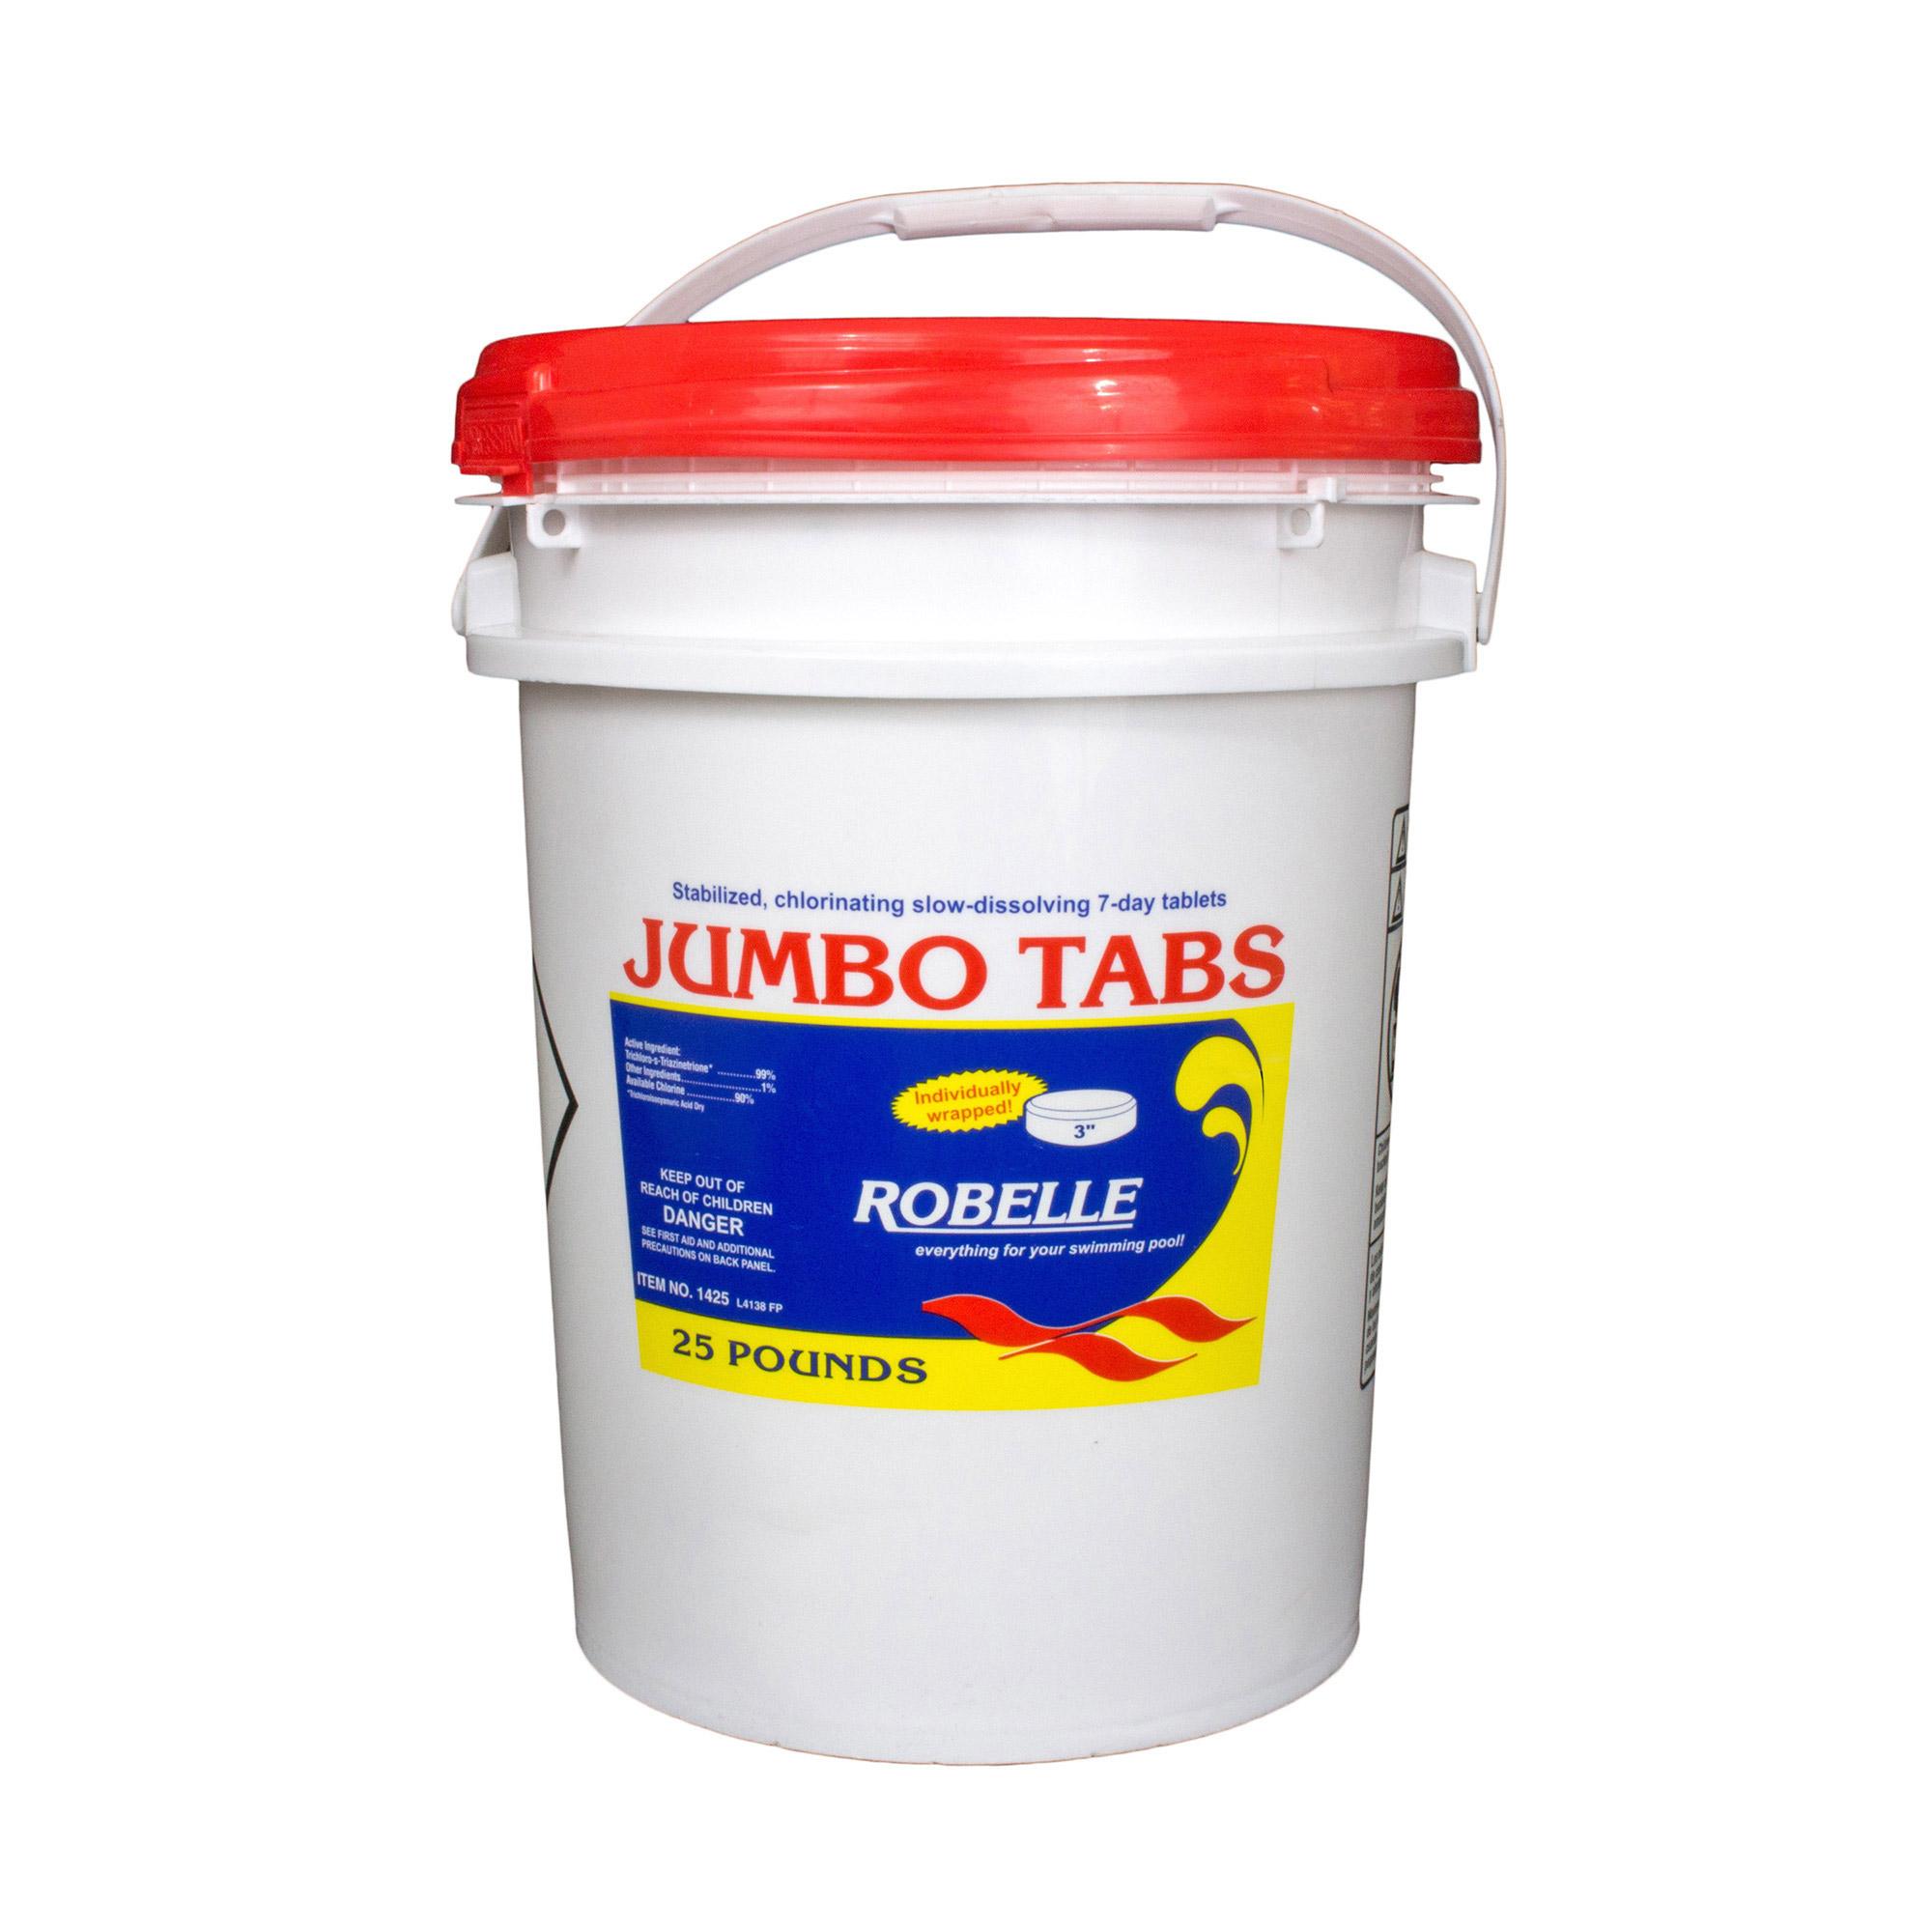 Robelle chlorine 3 jumbo tabs swimming pool sanitizer - Dangers of chlorine in swimming pools ...